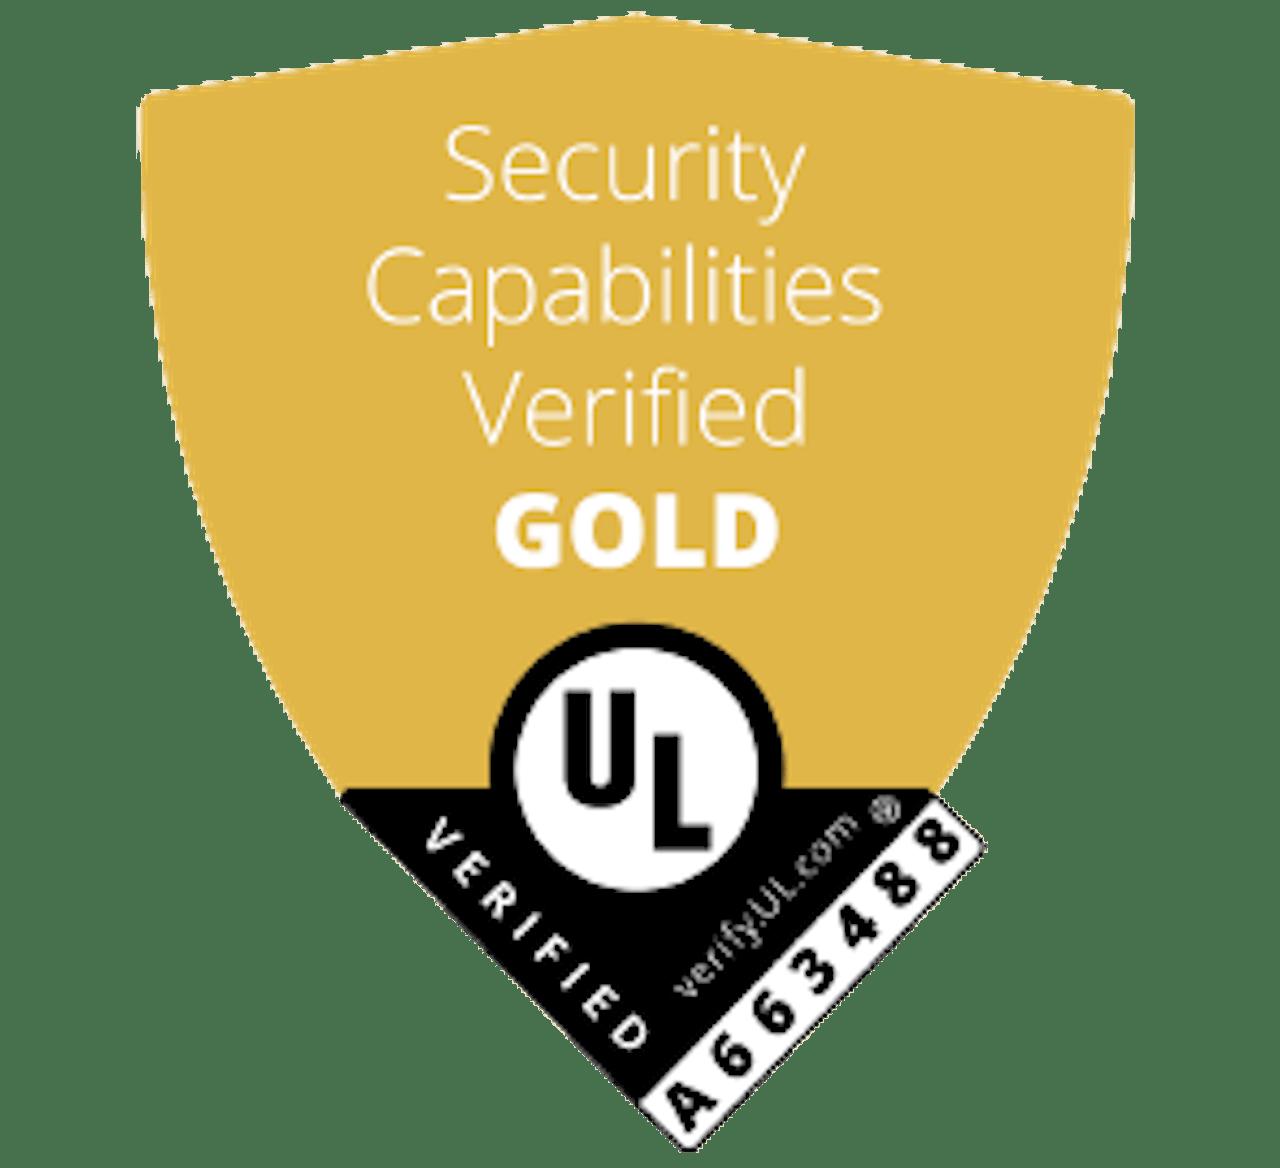 Security Capabilities Verified Gold UL logo